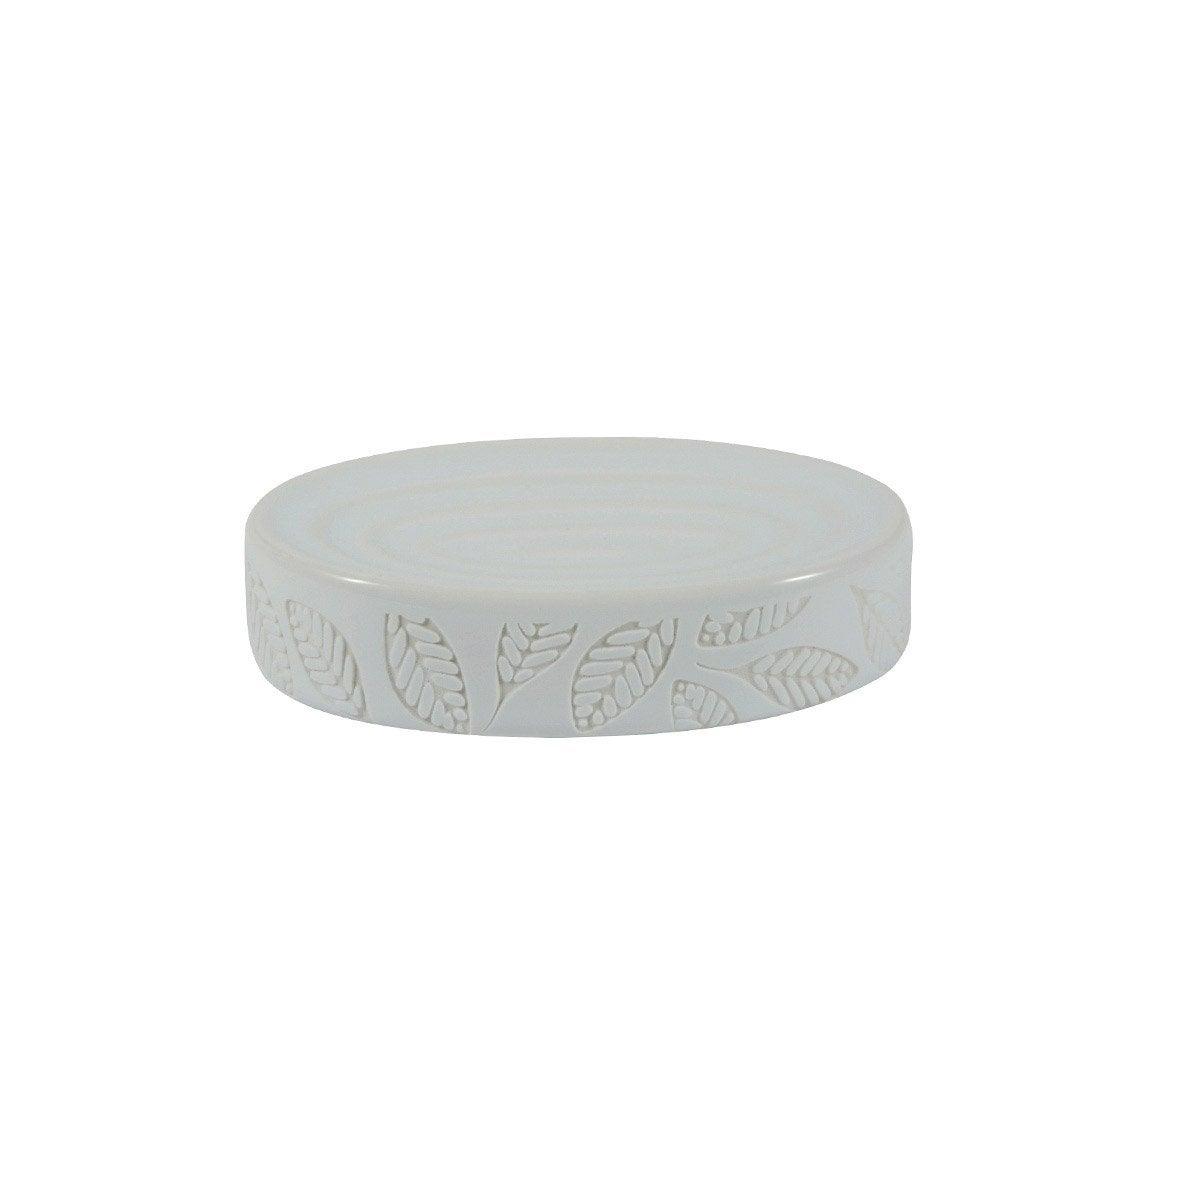 Porte-savon céramique Baya, blanc